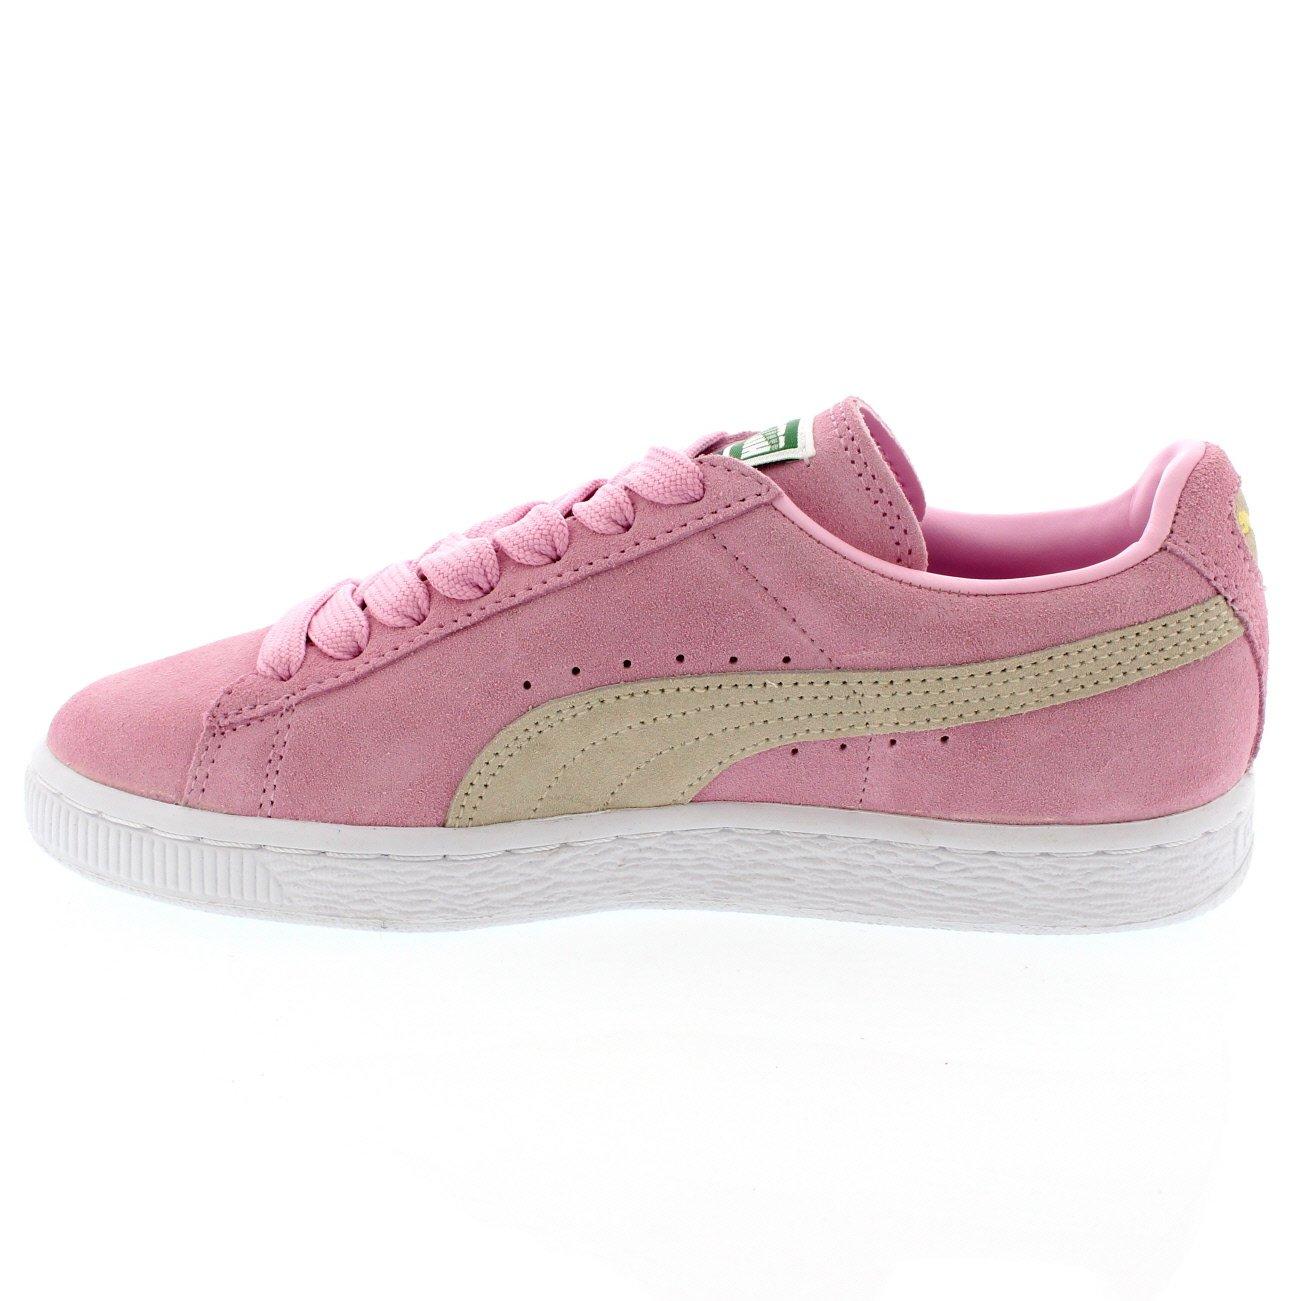 Puma Damen Wildleder Classic SL Schnüren Niedrig Top Schuhe